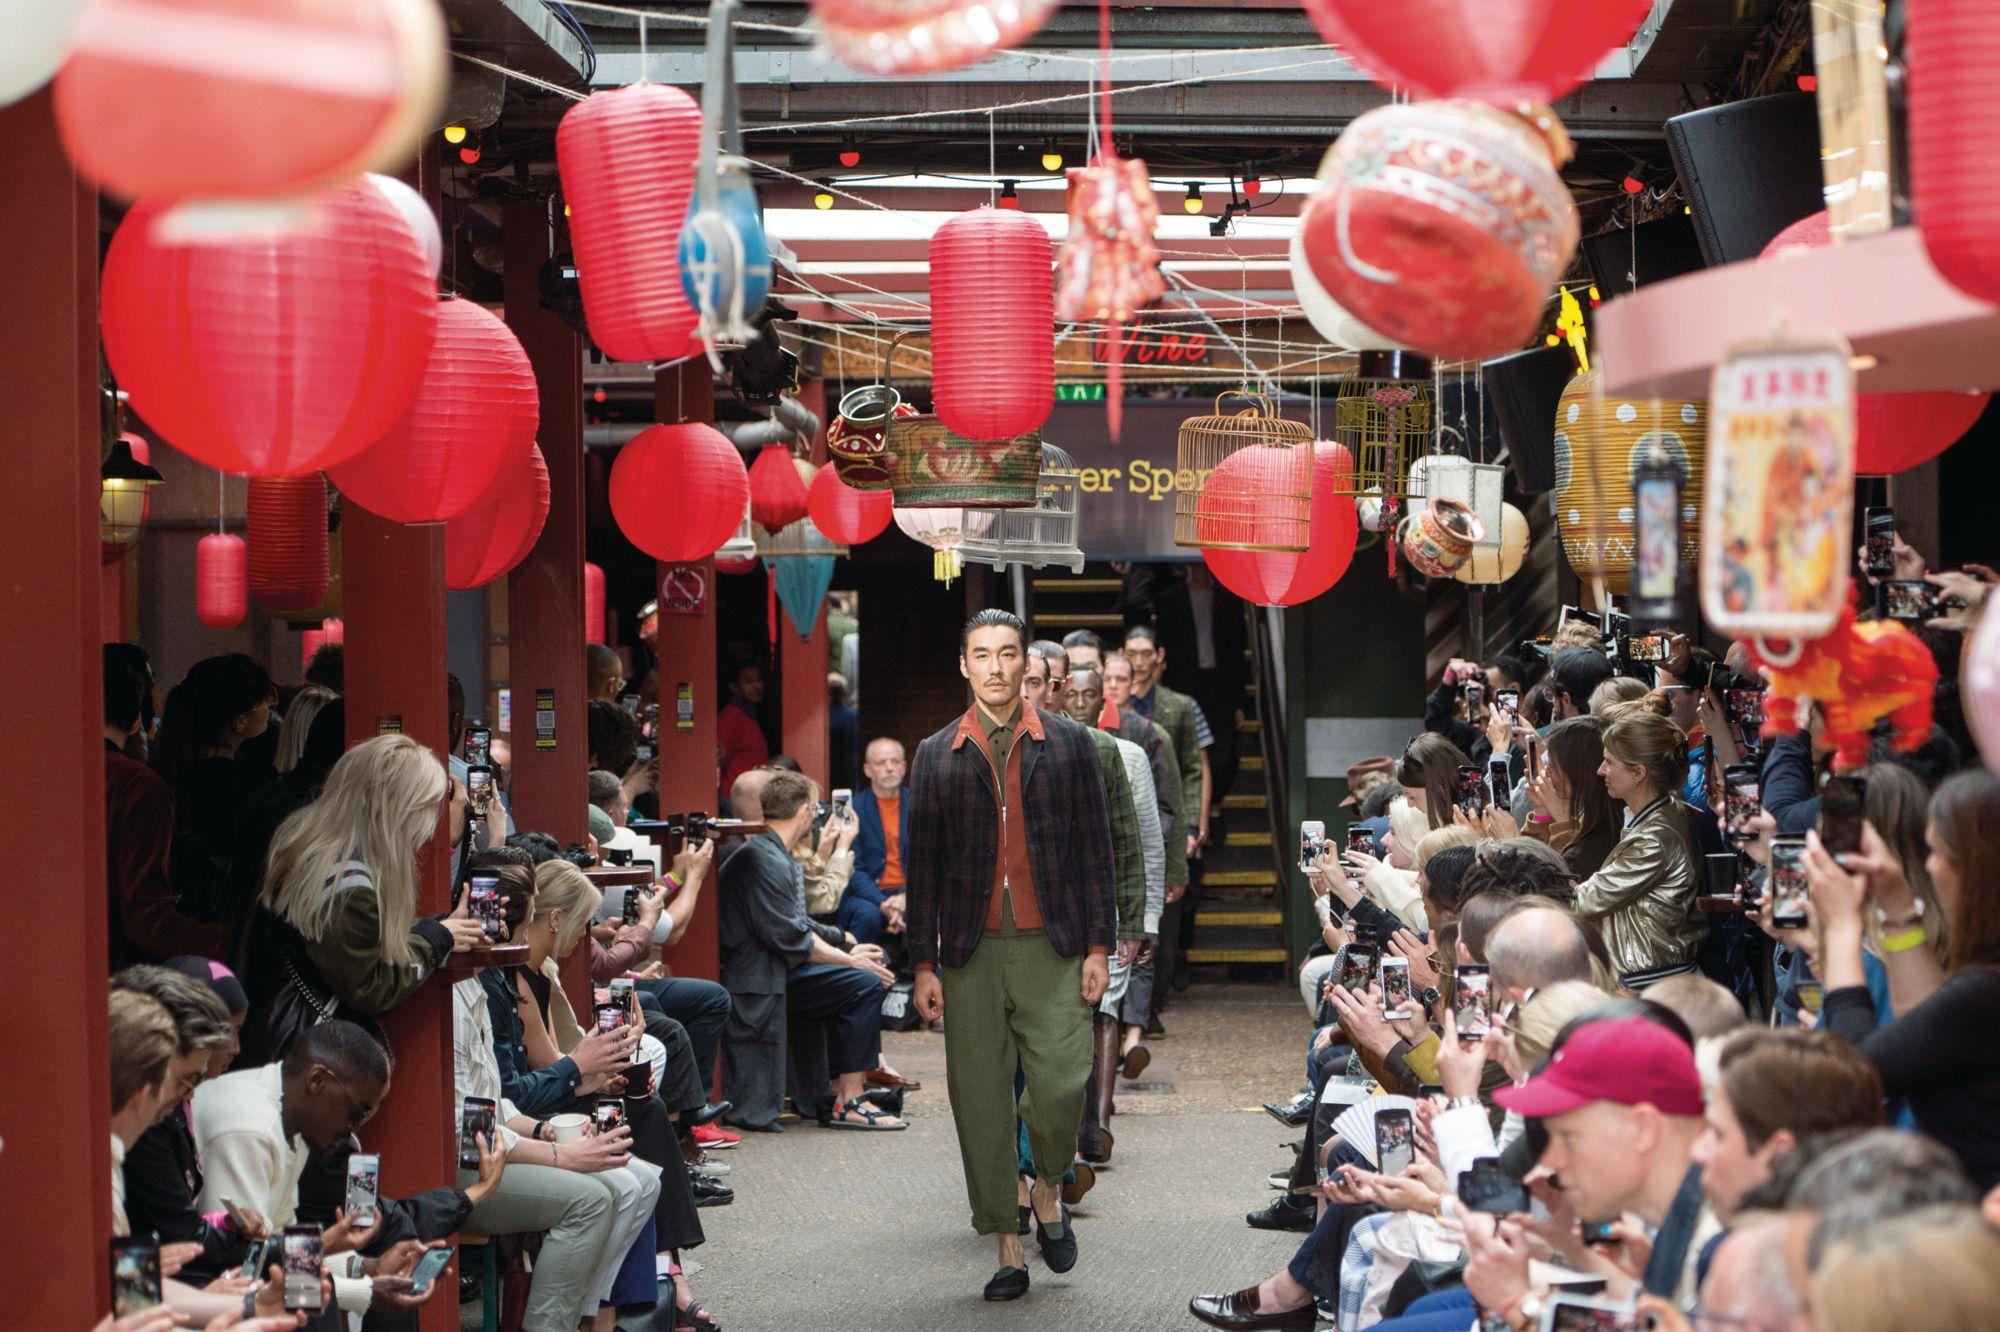 Oliver Spencer的2020年春夏服裝秀受到本片啟發